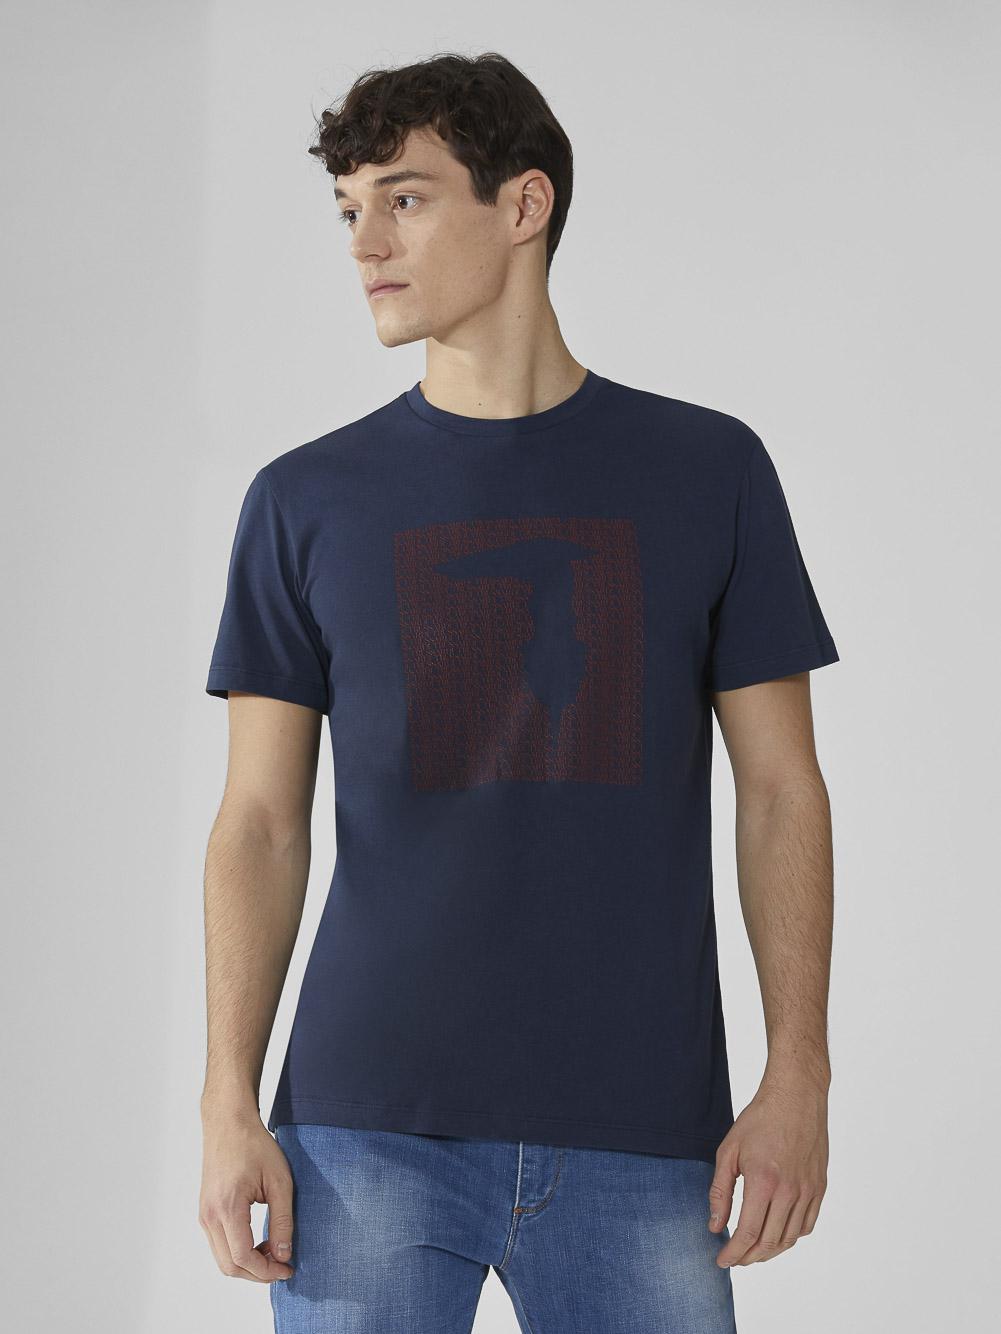 TRUSSARDI JEANS Μπλούζα T-shirt 352T003111T003605 ΜΠΛΕ